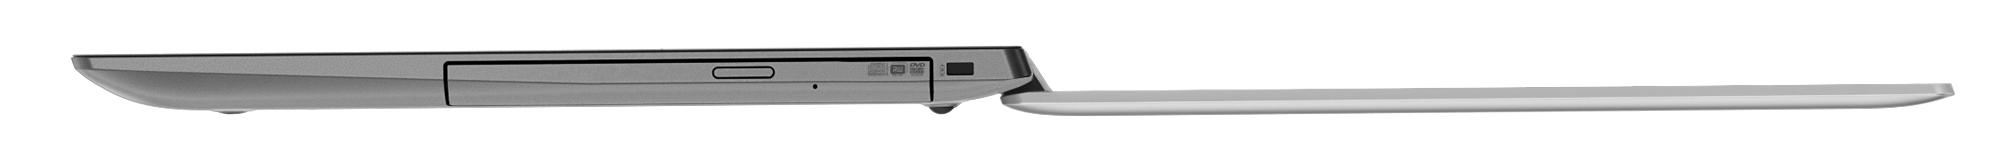 Фото  Ноутбук Lenovo ideapad 330-15 Platinum Grey (81DC00RERA)